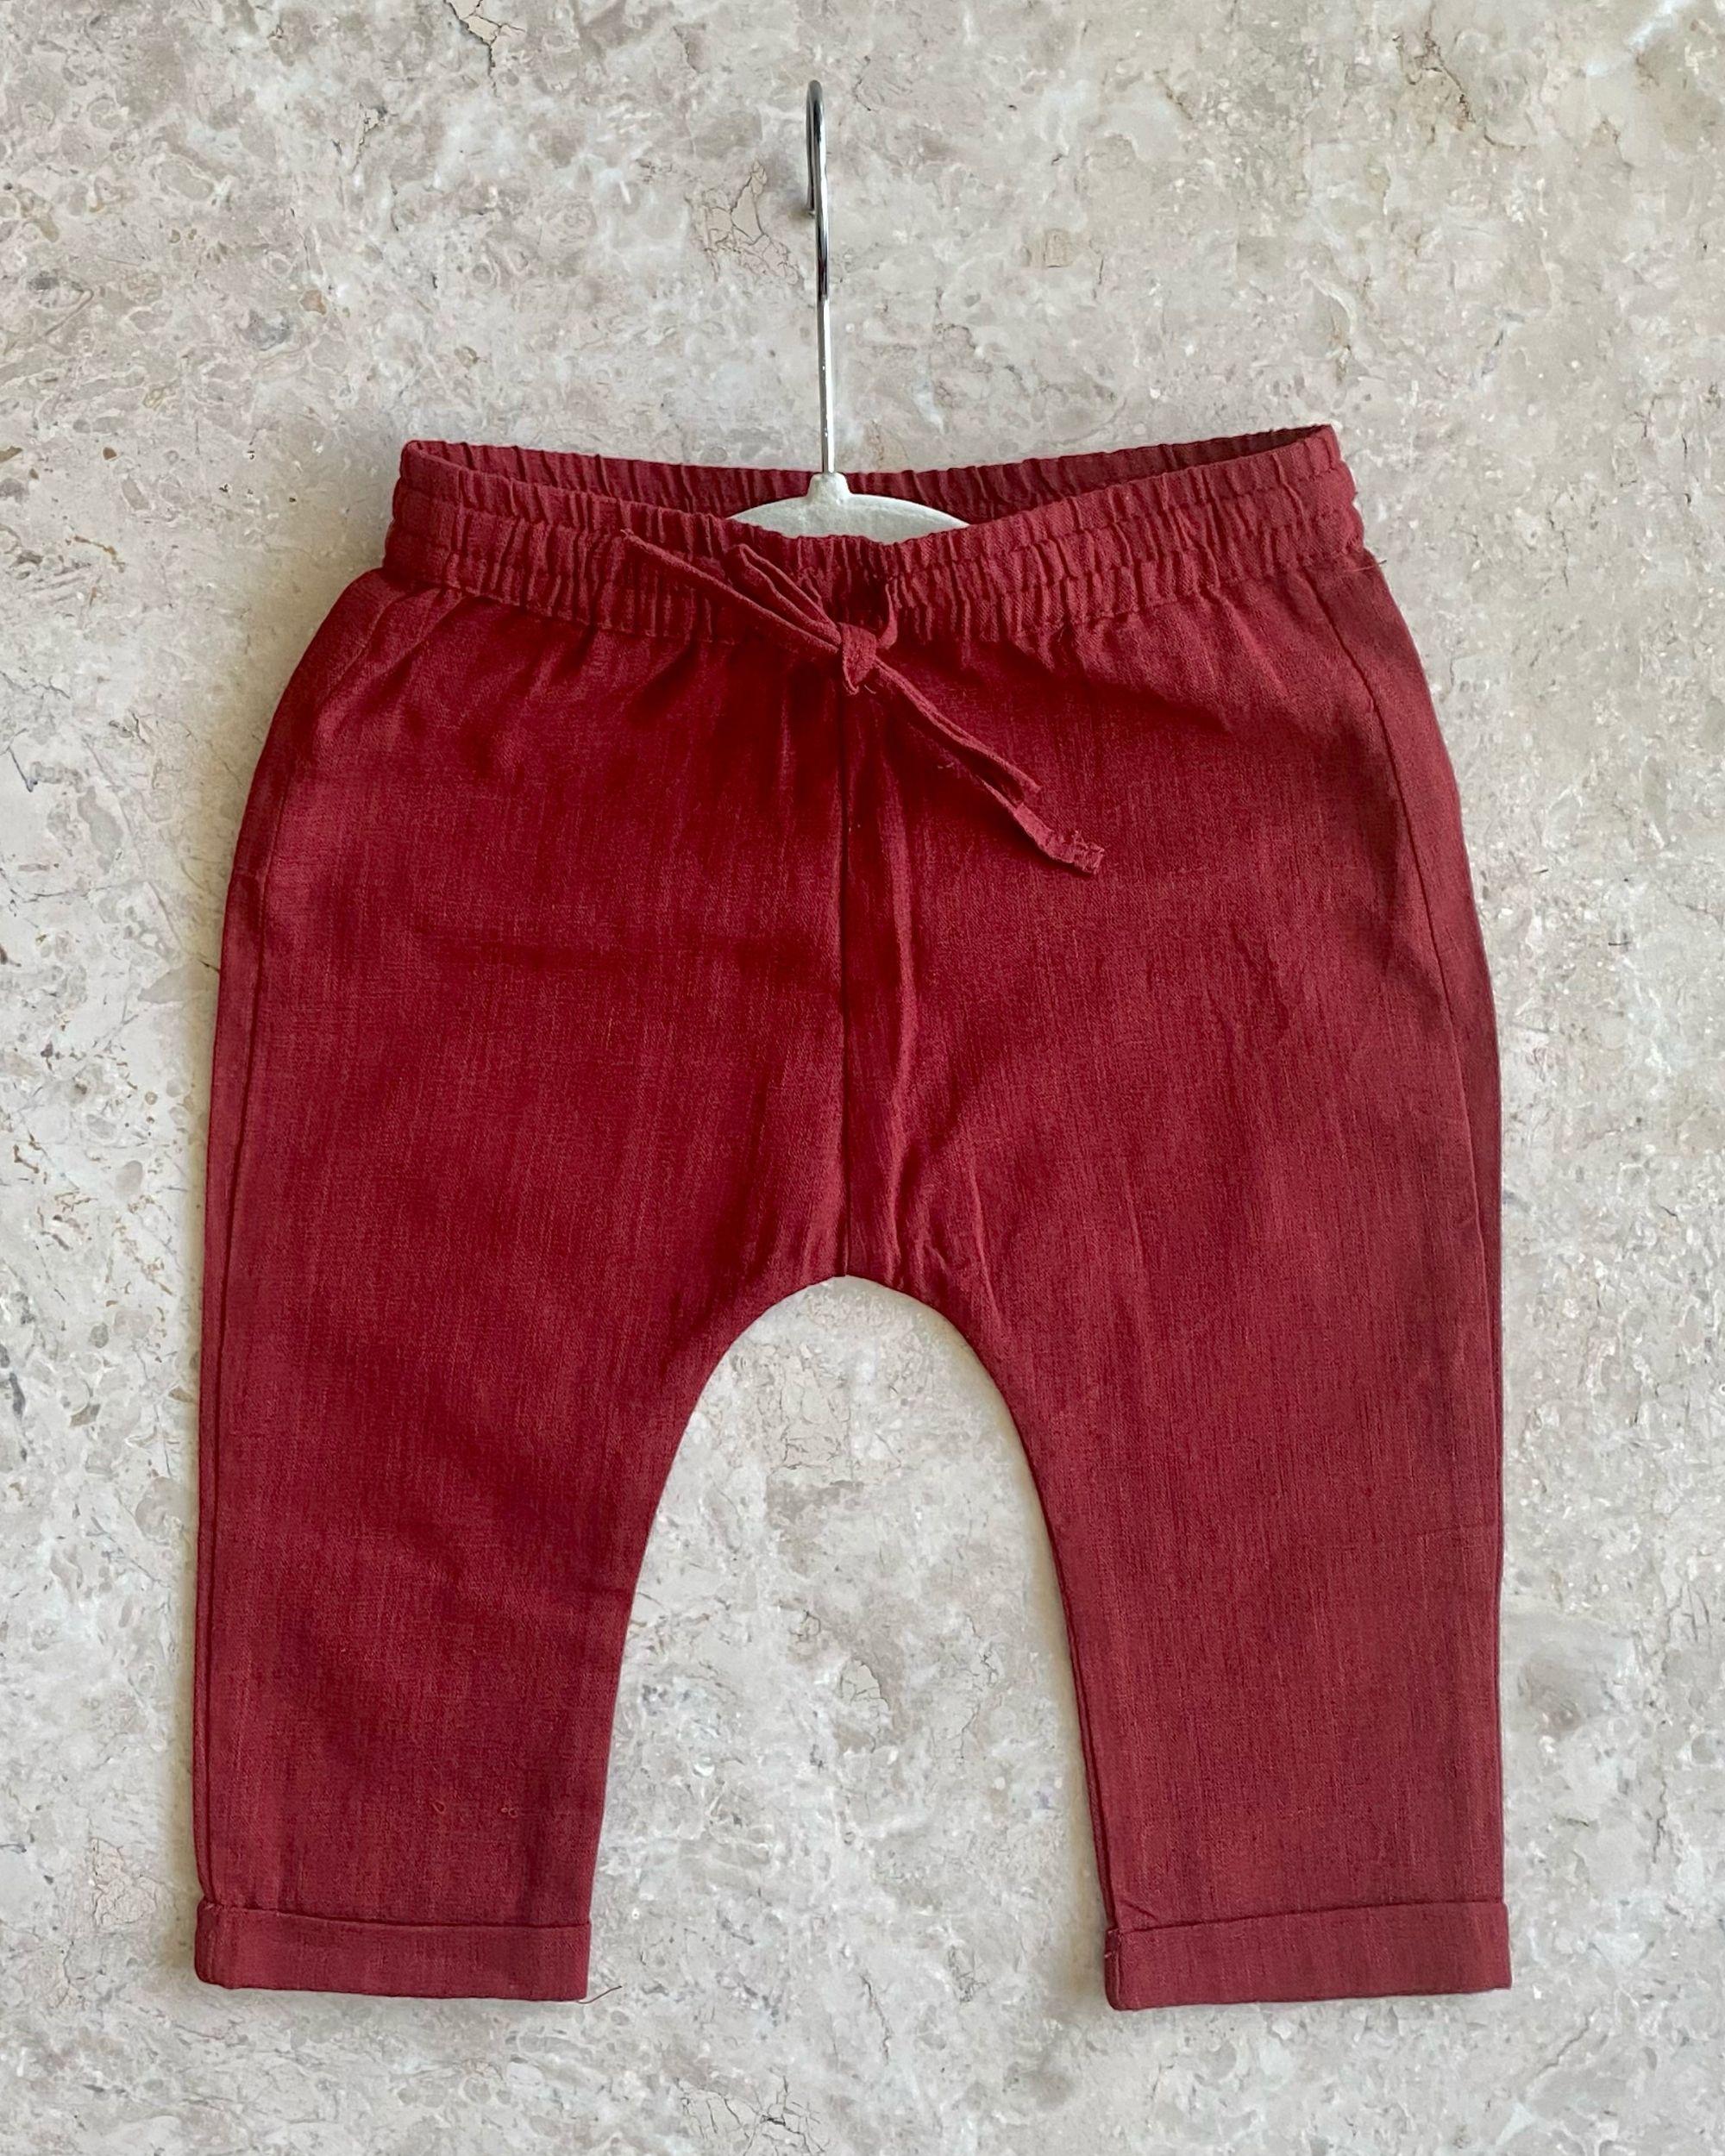 Red malkha cotton pants